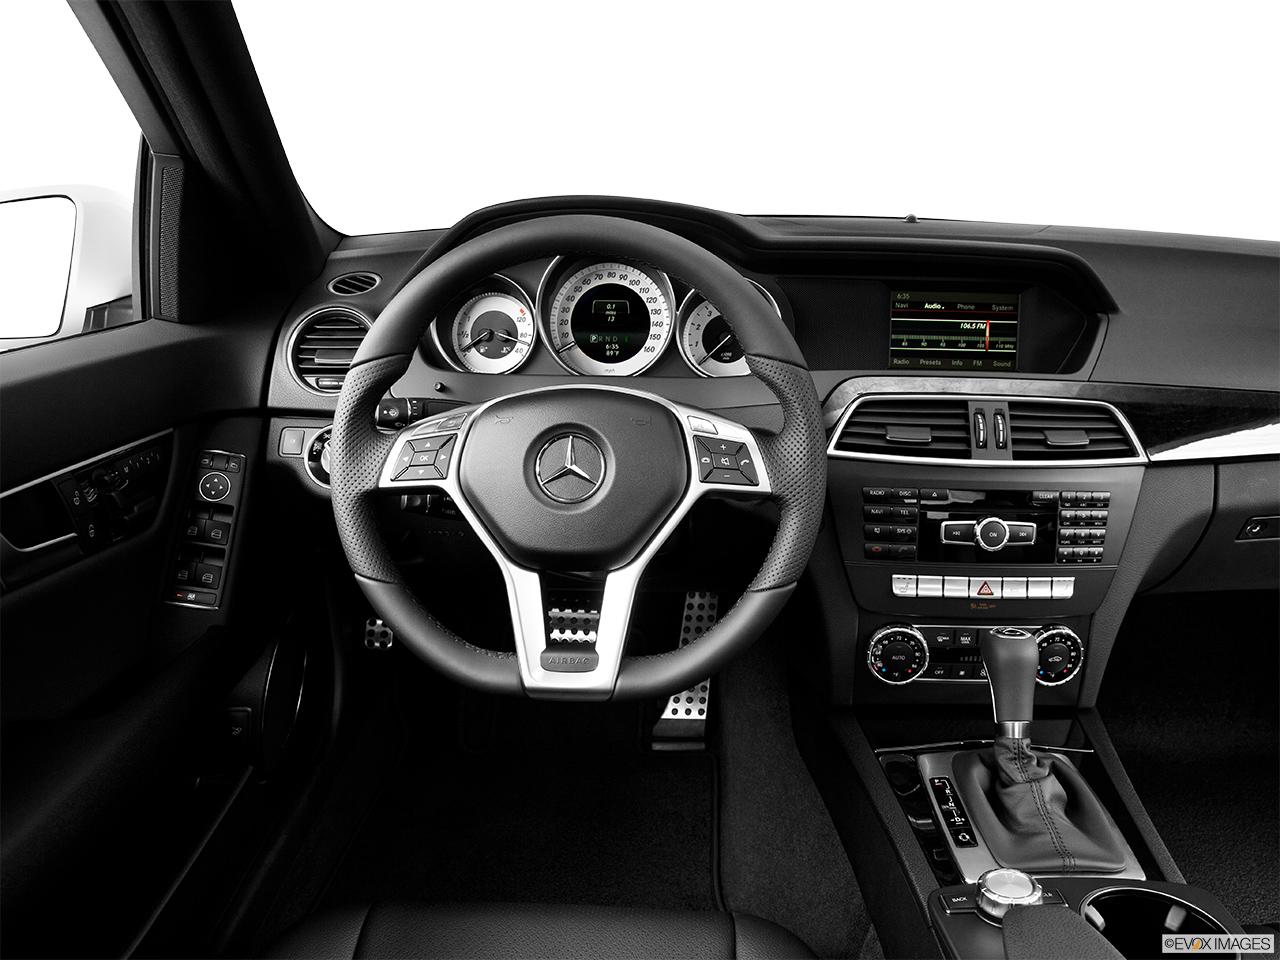 2014 MercedesBenz CClass Sedan C300 Luxury 4MATIC